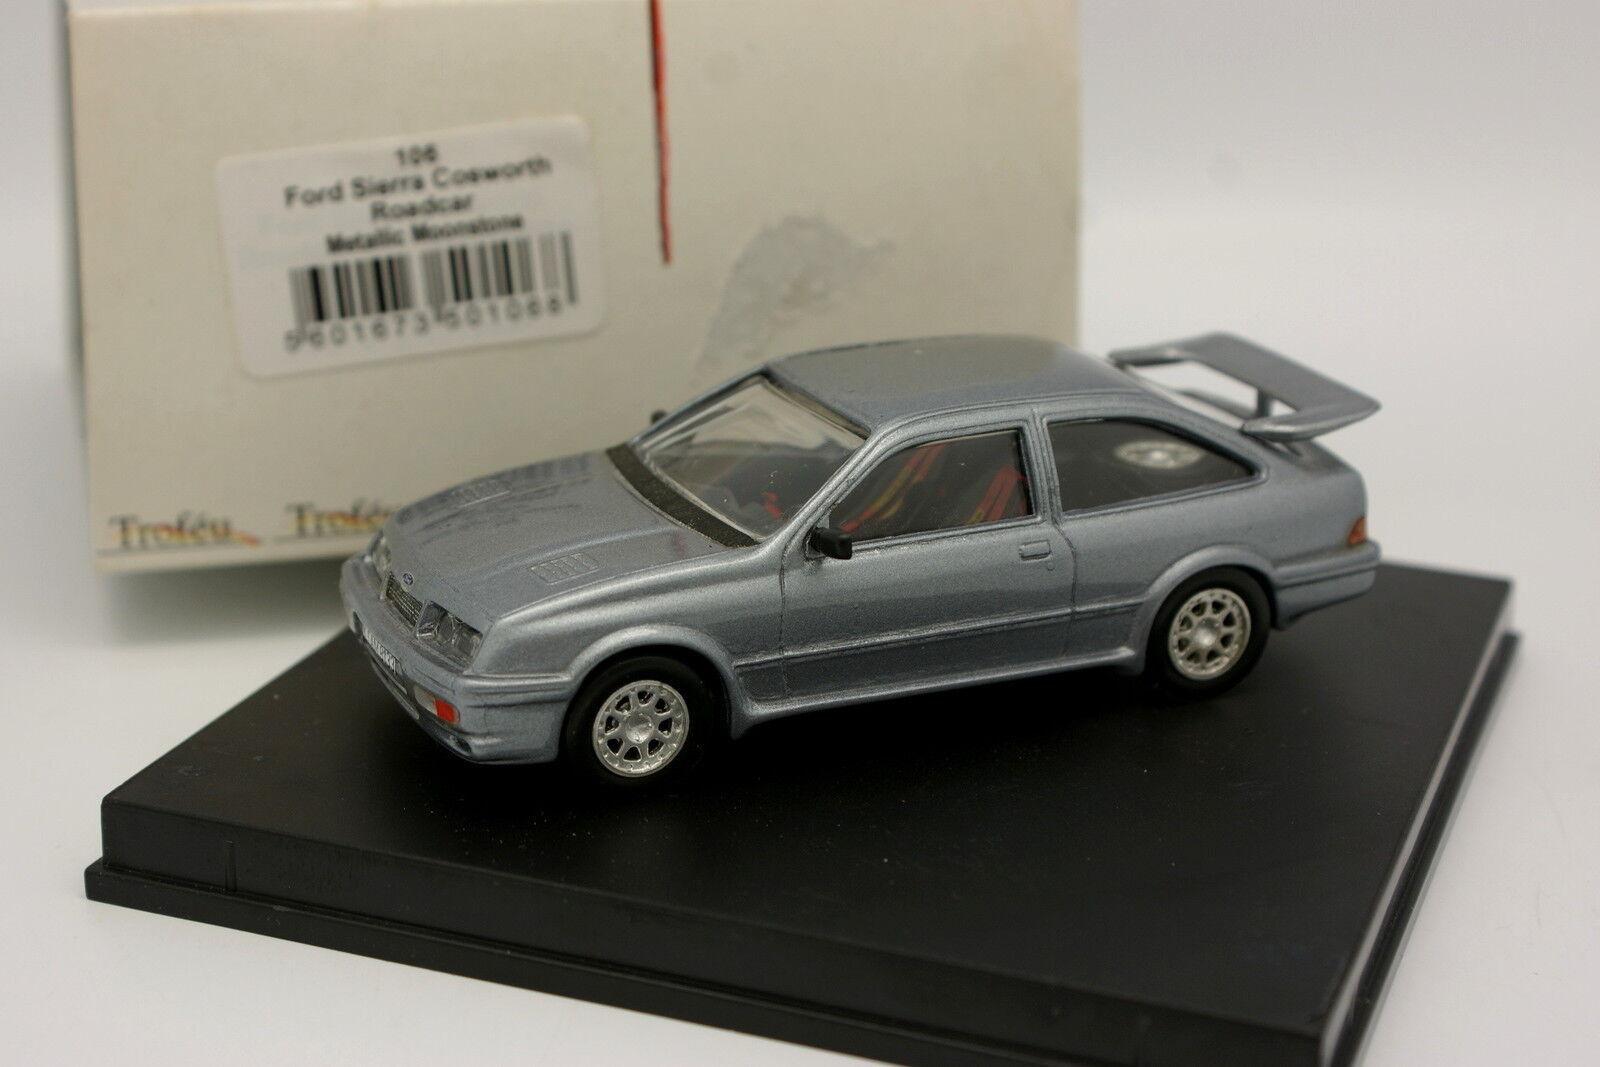 Trofeu 1 43 - Ford Sierra Cosworth Metallic Moonstone